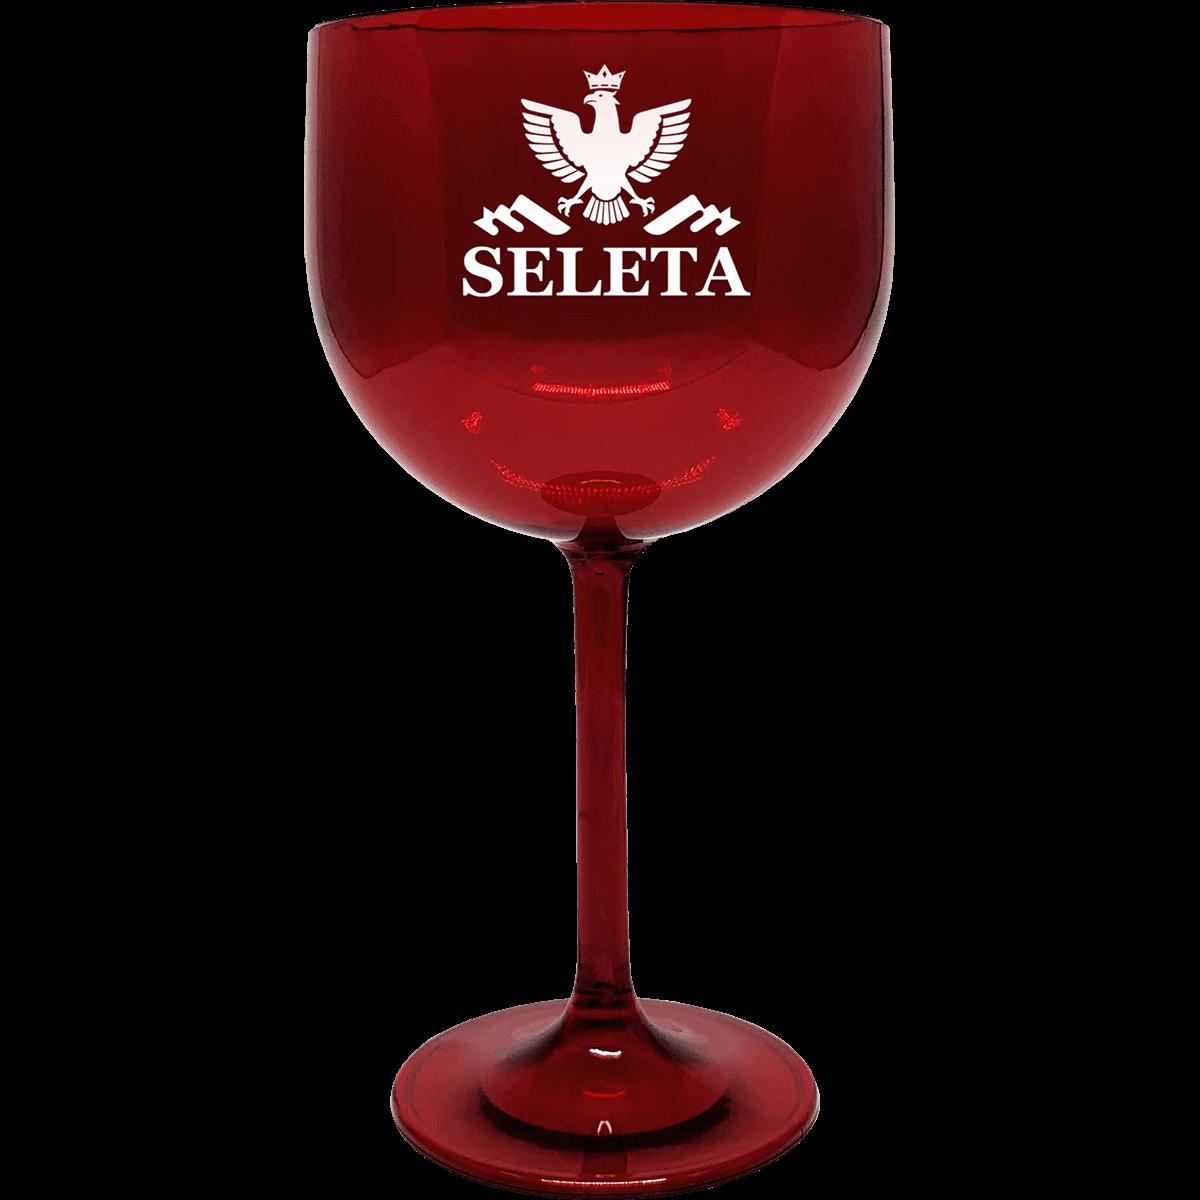 Taça Seleta personalizada vermelha